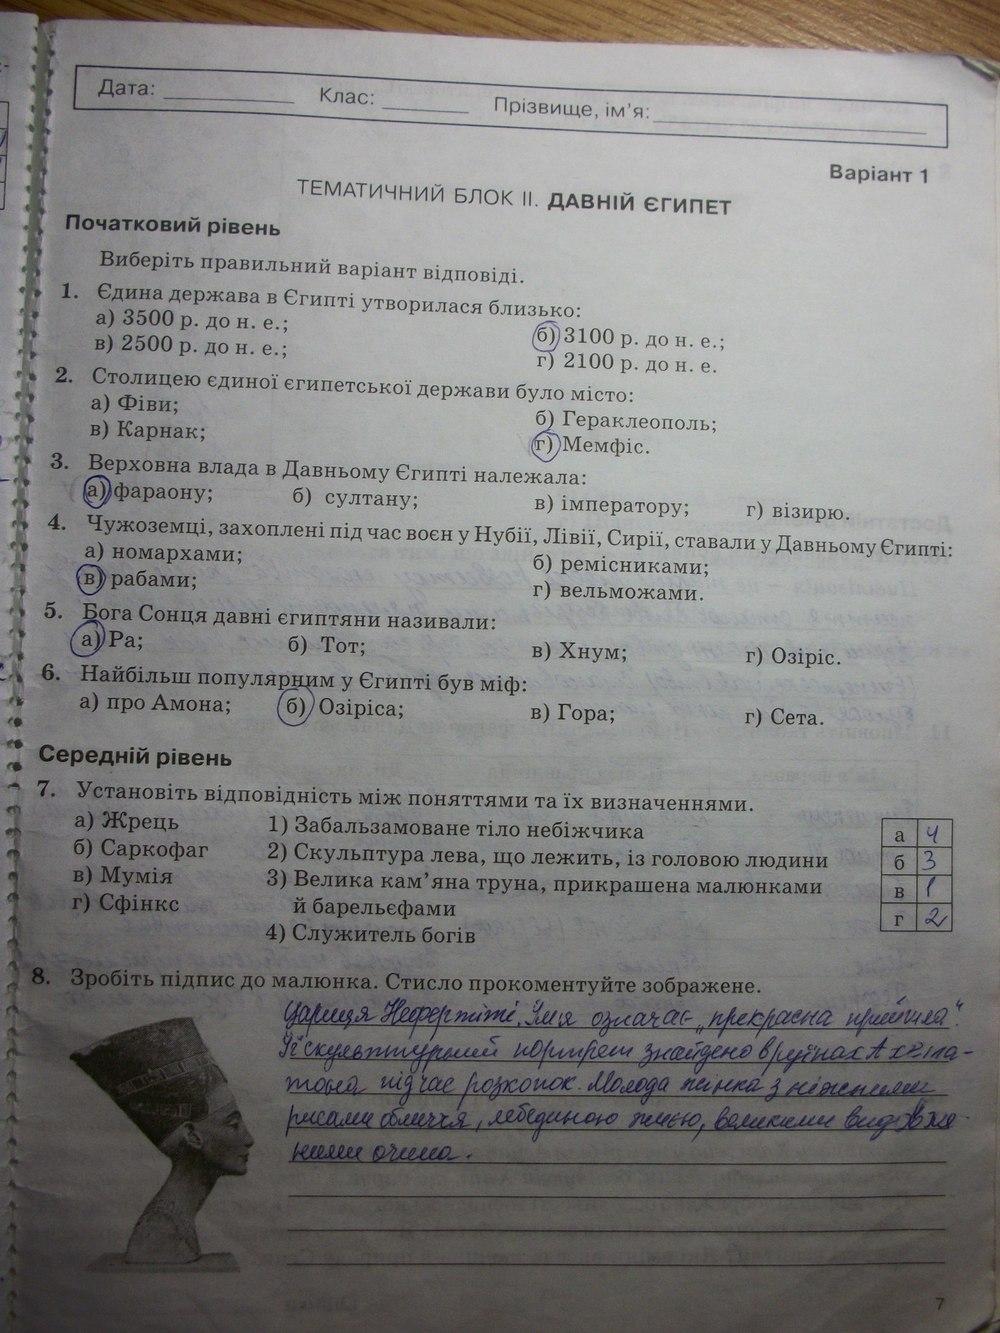 ГДЗ рабочие тетради 6 класс. Задание: стр. 7